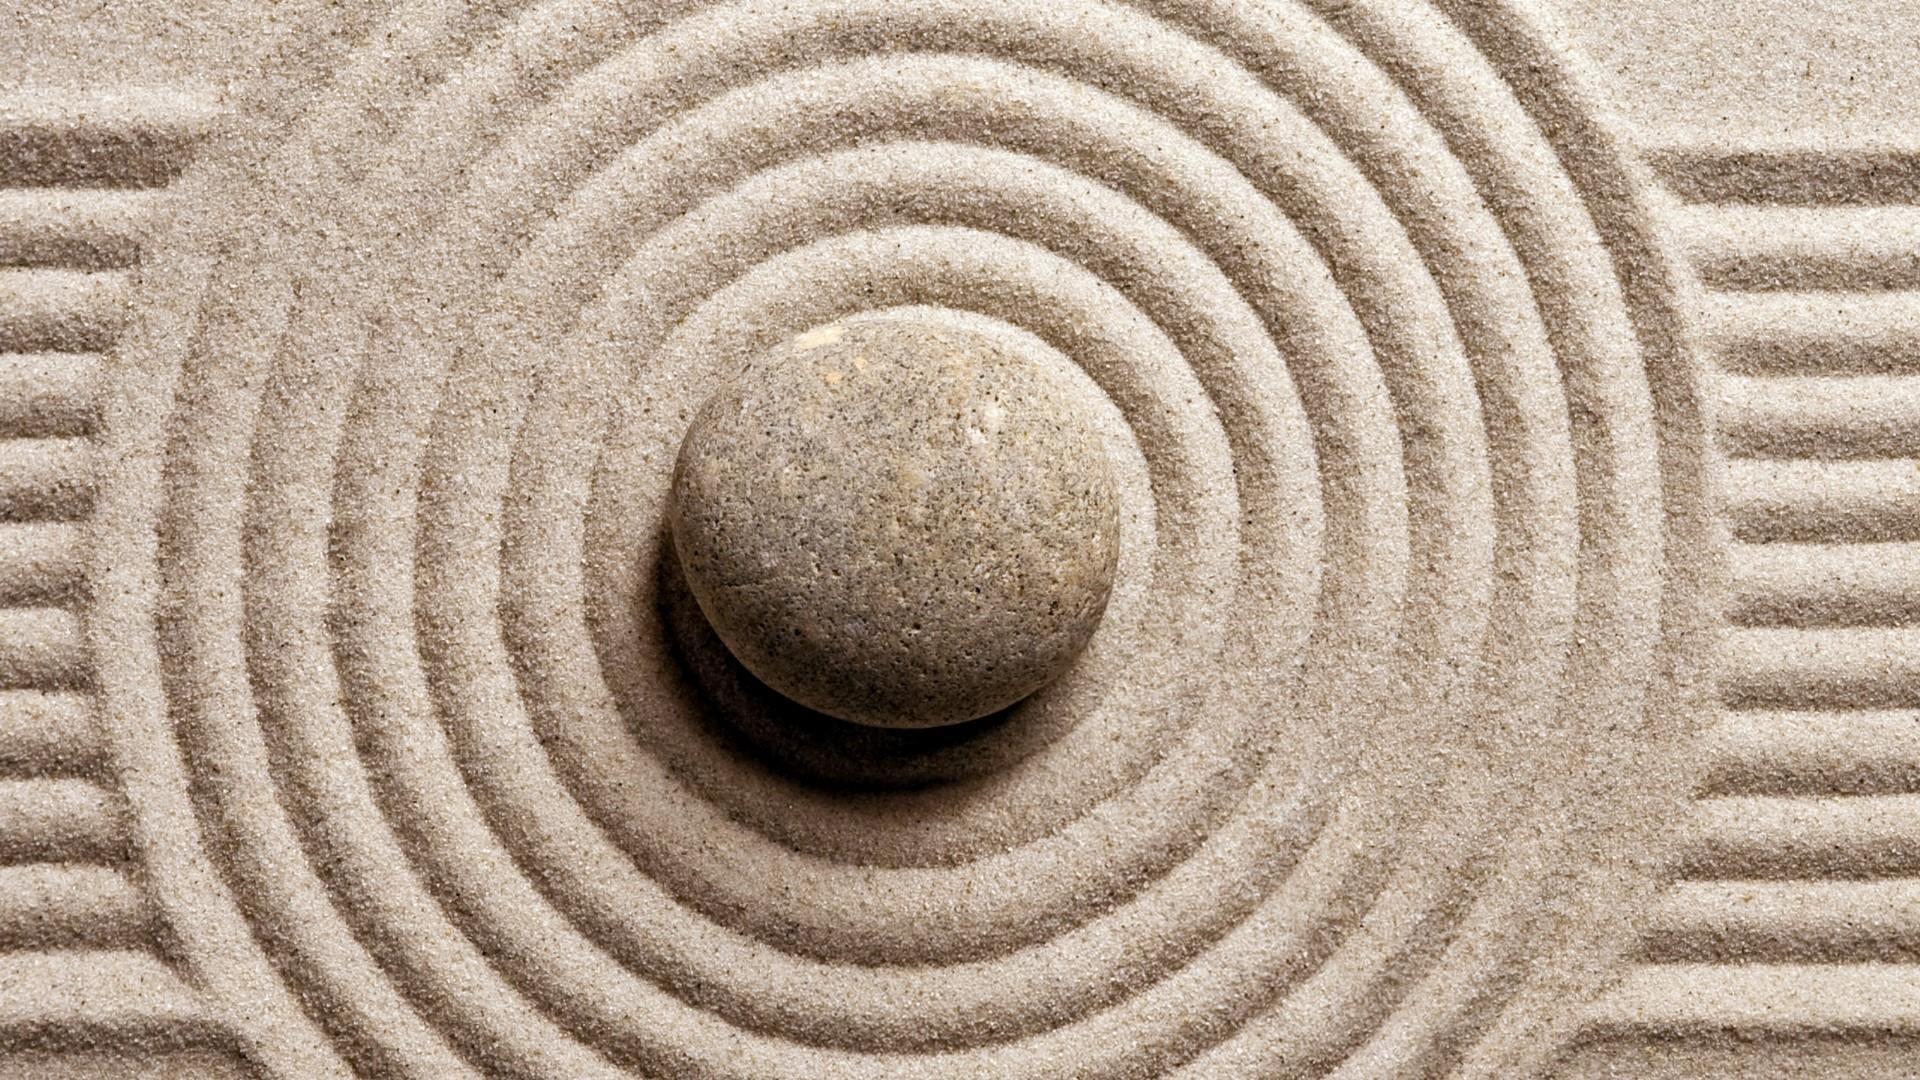 Zen stone in the sand ☯️ wallpaper